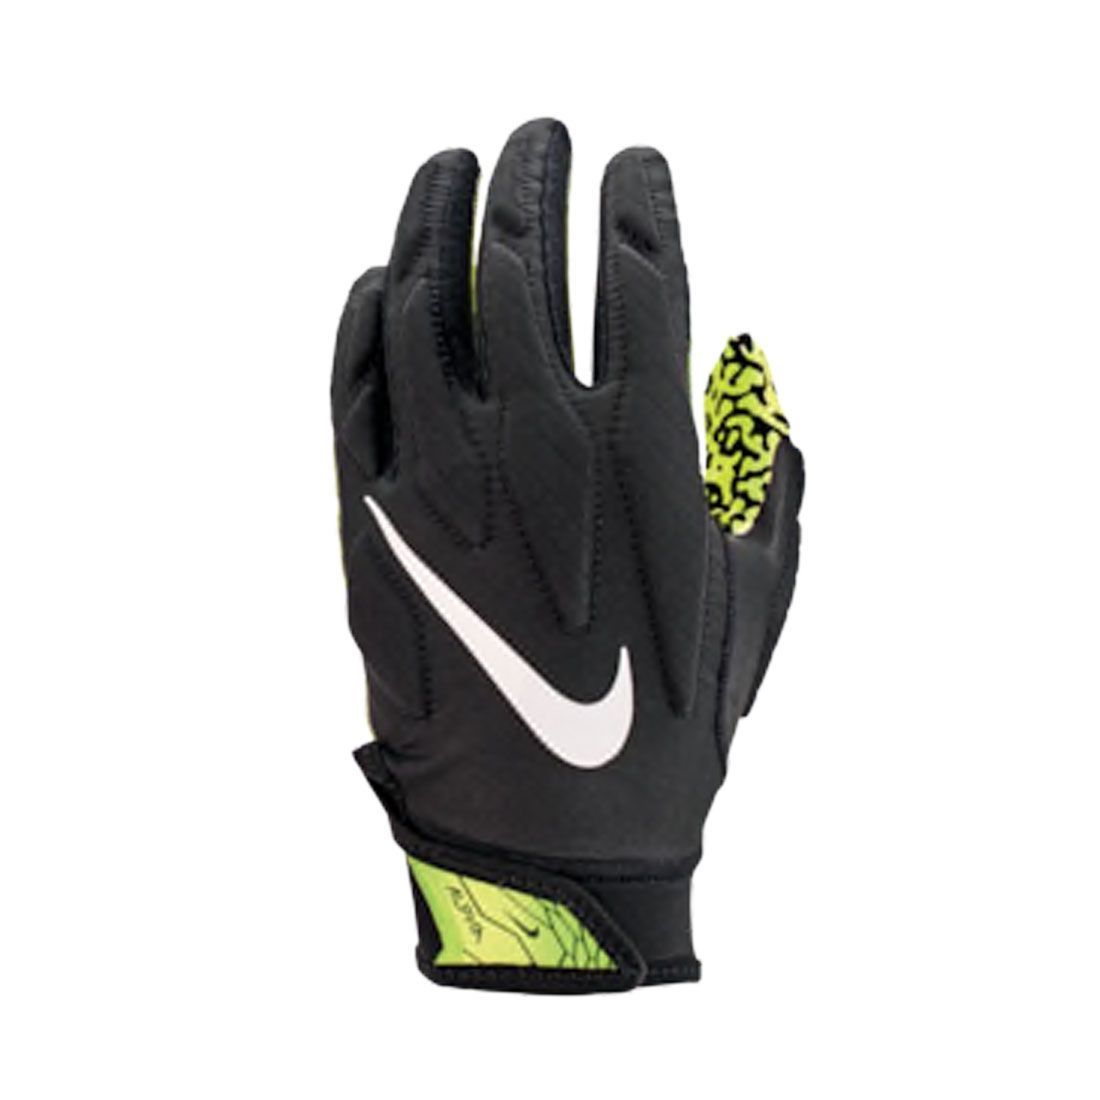 manzana 945 Agradecido  Nike Superbad 5.0 Youth (N0002726) - Forelle Teamsports - American  Football, Baseball, Softball Equipment Specialist